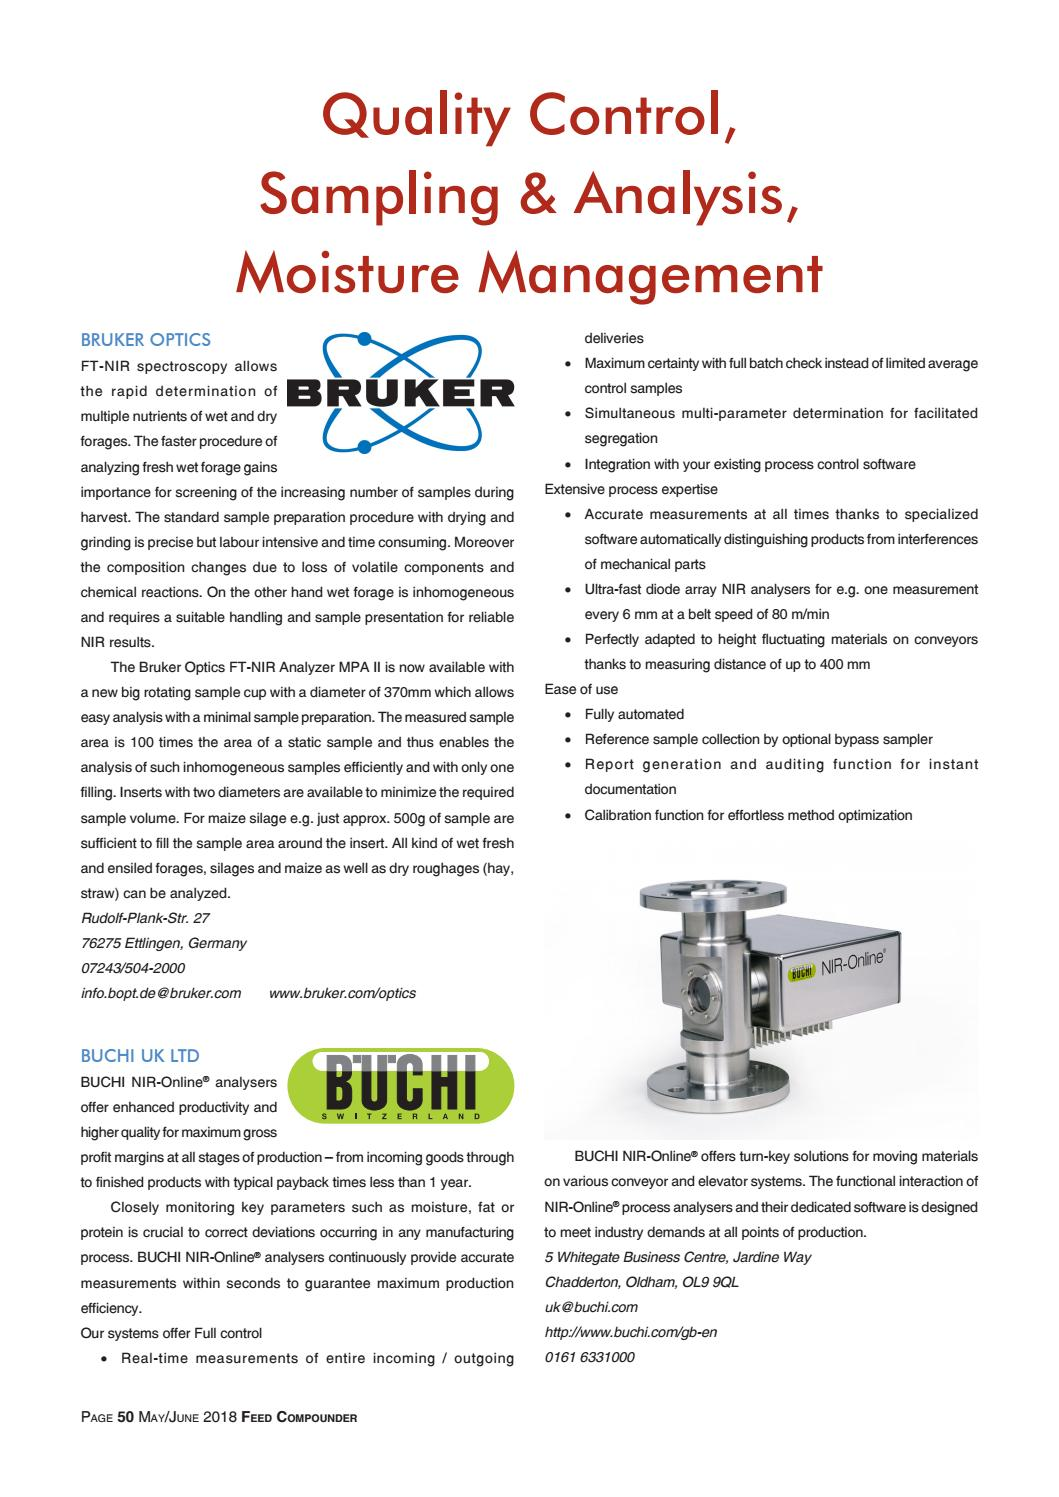 Moisture Management Of Parapet Walls: Quality Control, Sampling & Analysis, Moisture Management